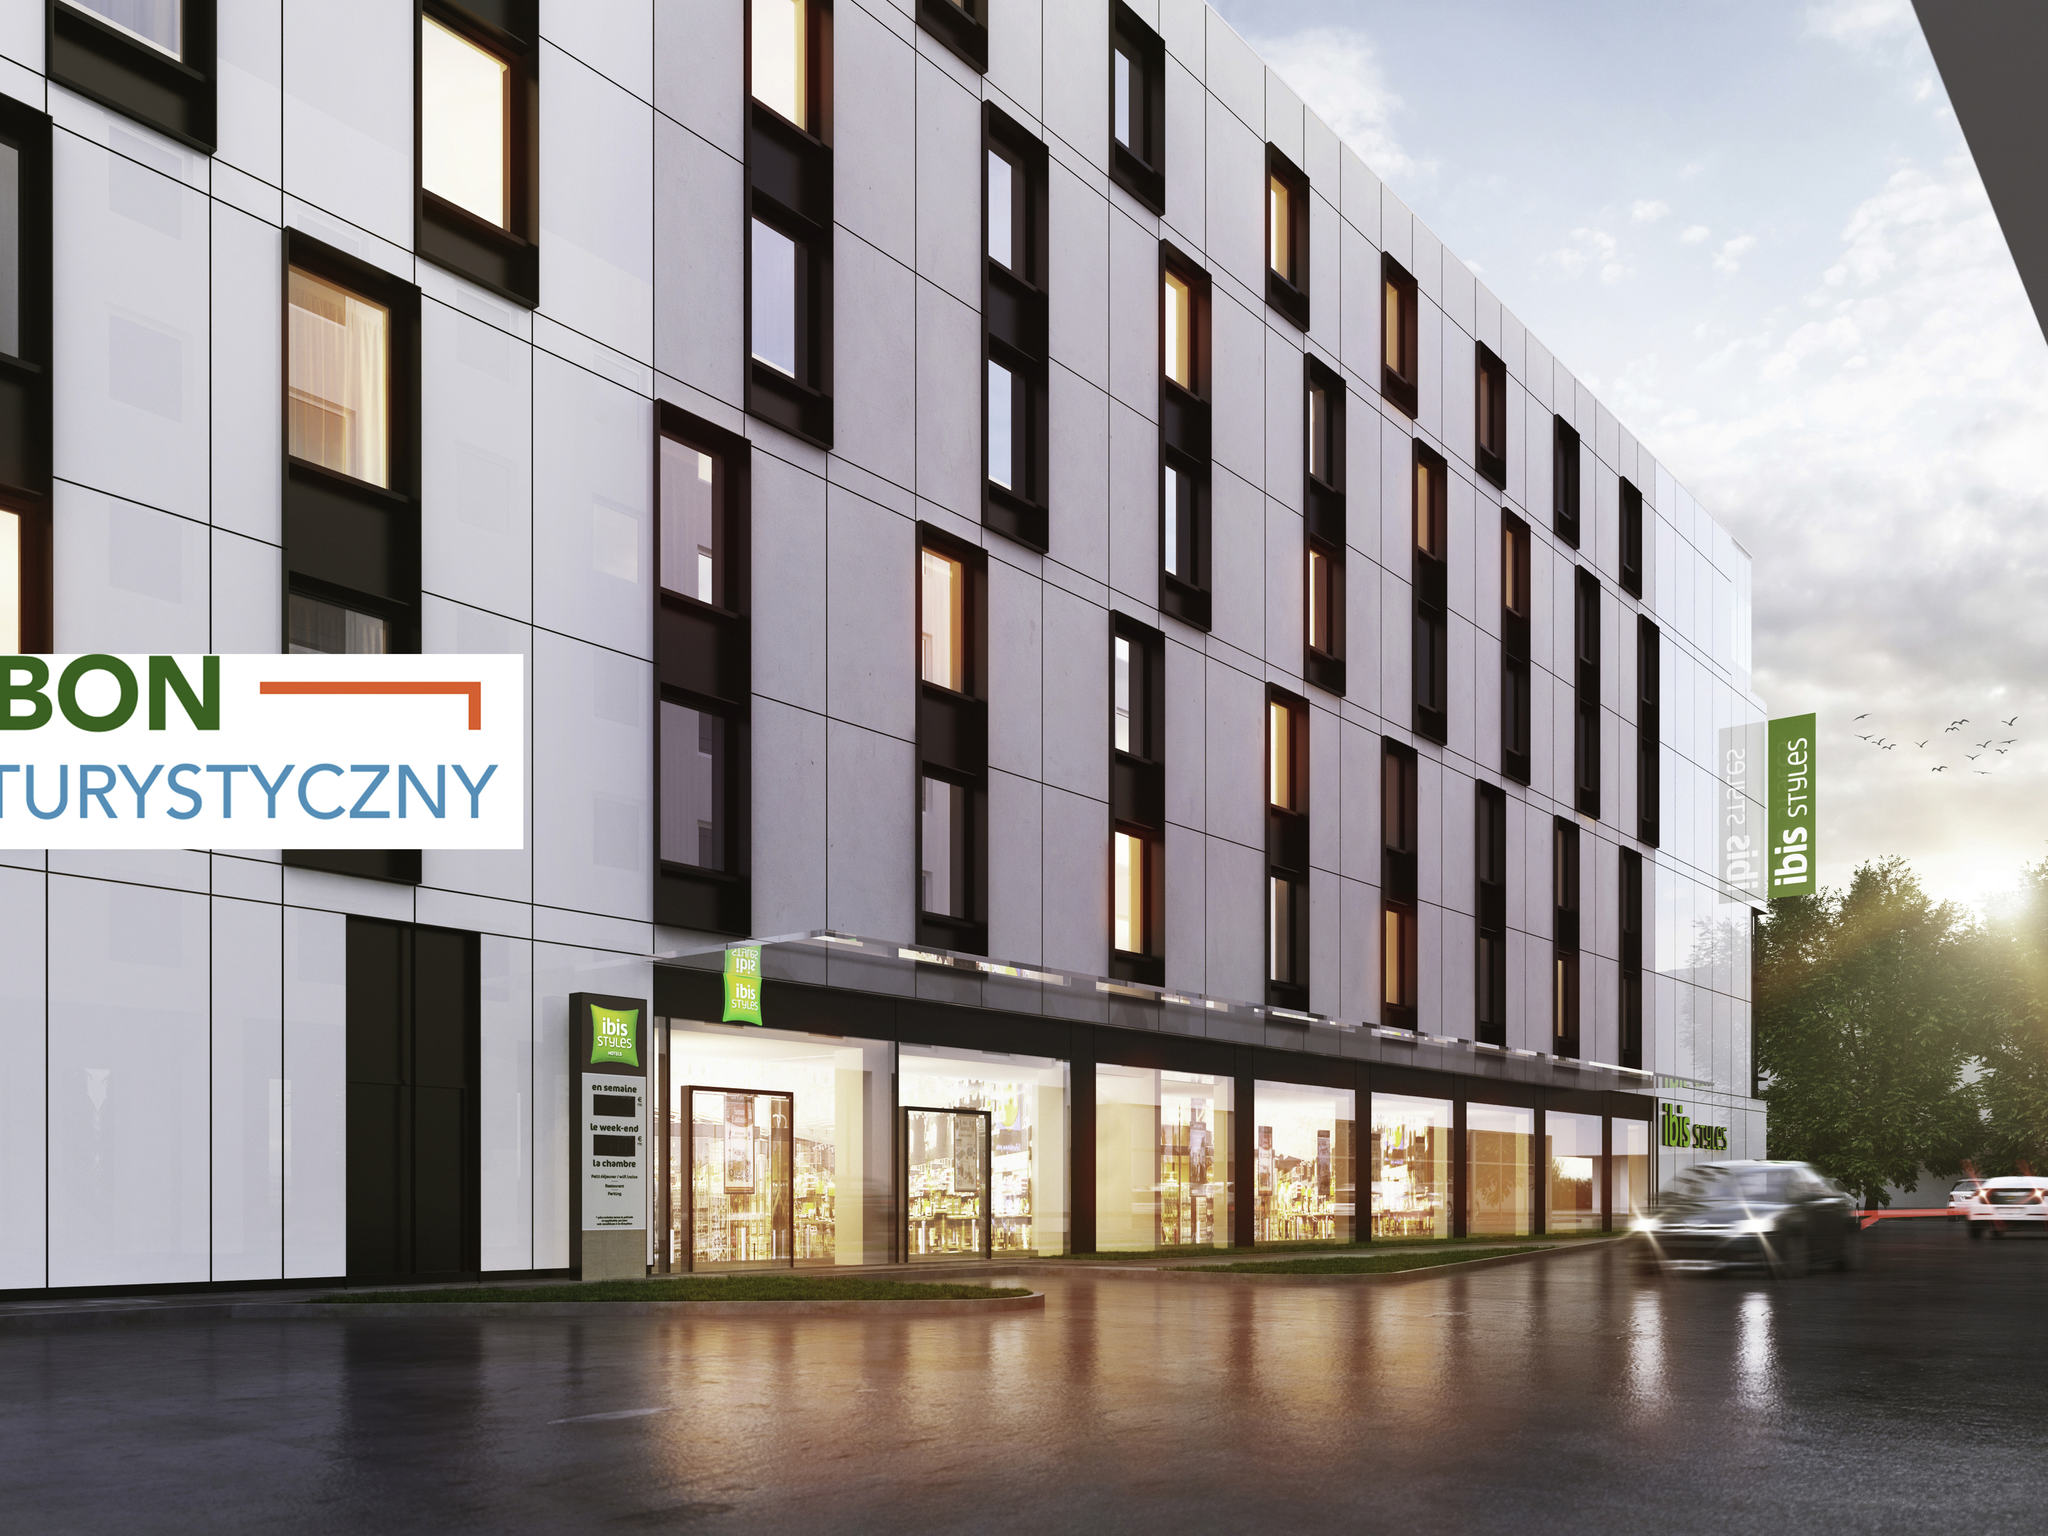 Hotel – Ibis Styles Warszawa Centrum (opening: november 2018)